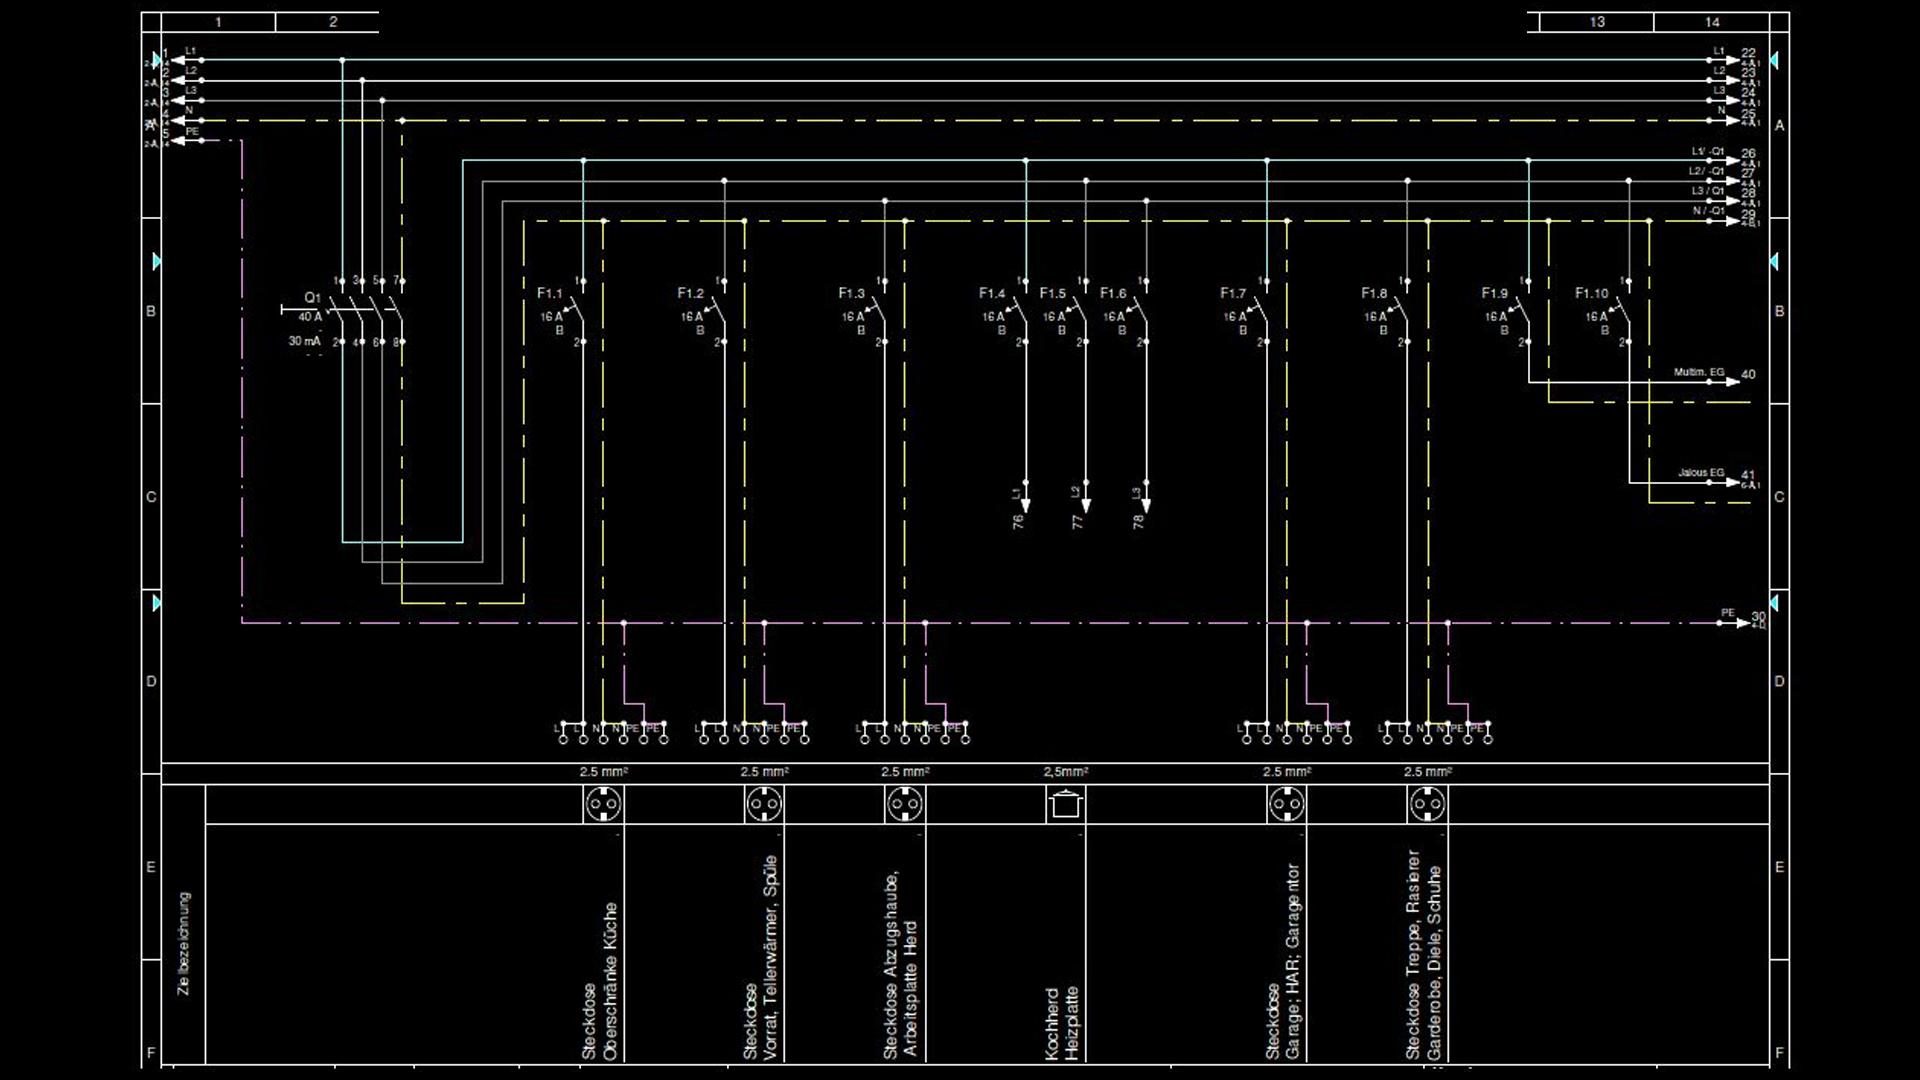 famous elektroinstallationsdiagramm pictures der schaltplan. Black Bedroom Furniture Sets. Home Design Ideas